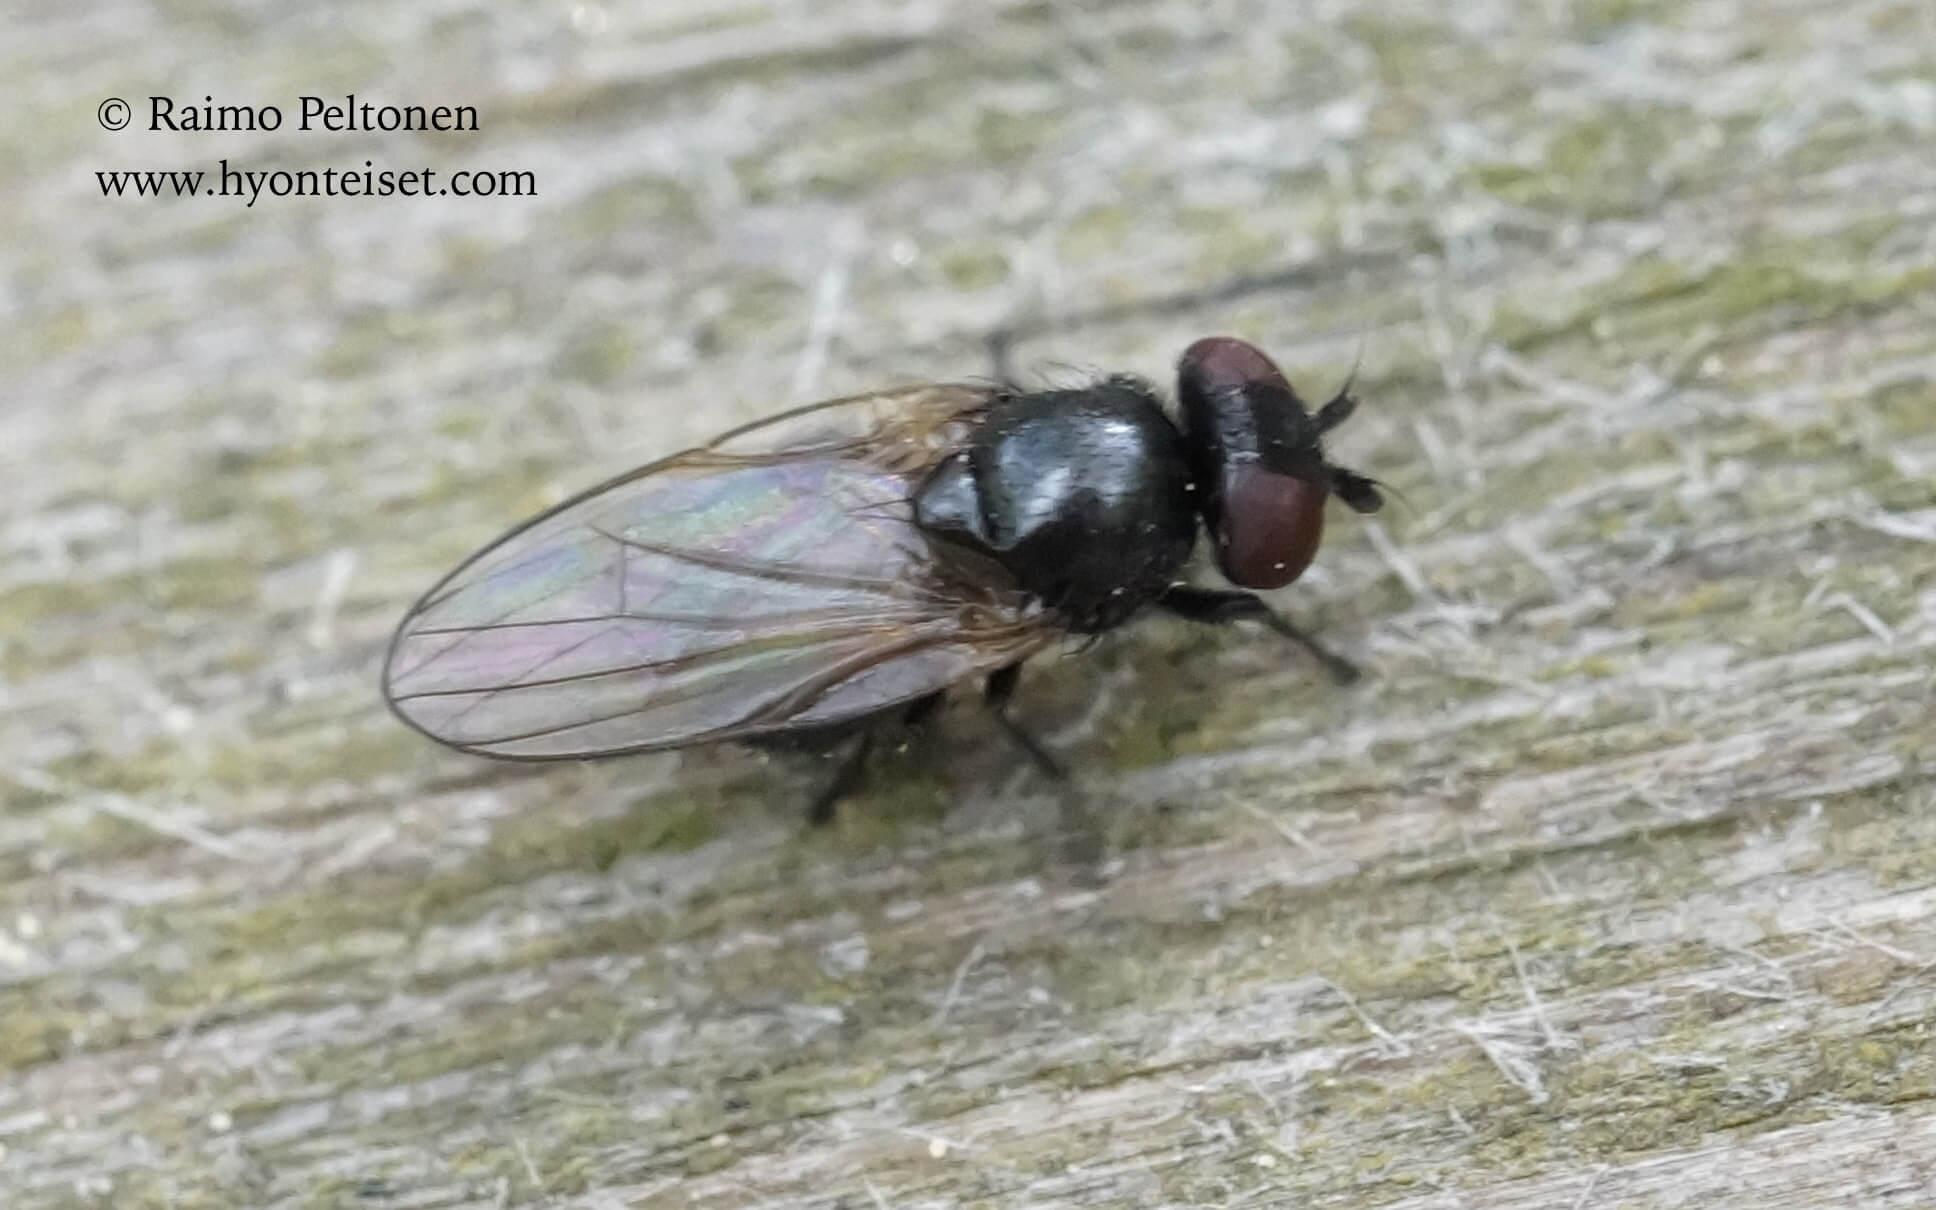 Lonchaeidae sp. (det. Kaj Winqvist), 23.5.2016 Jyväskylä